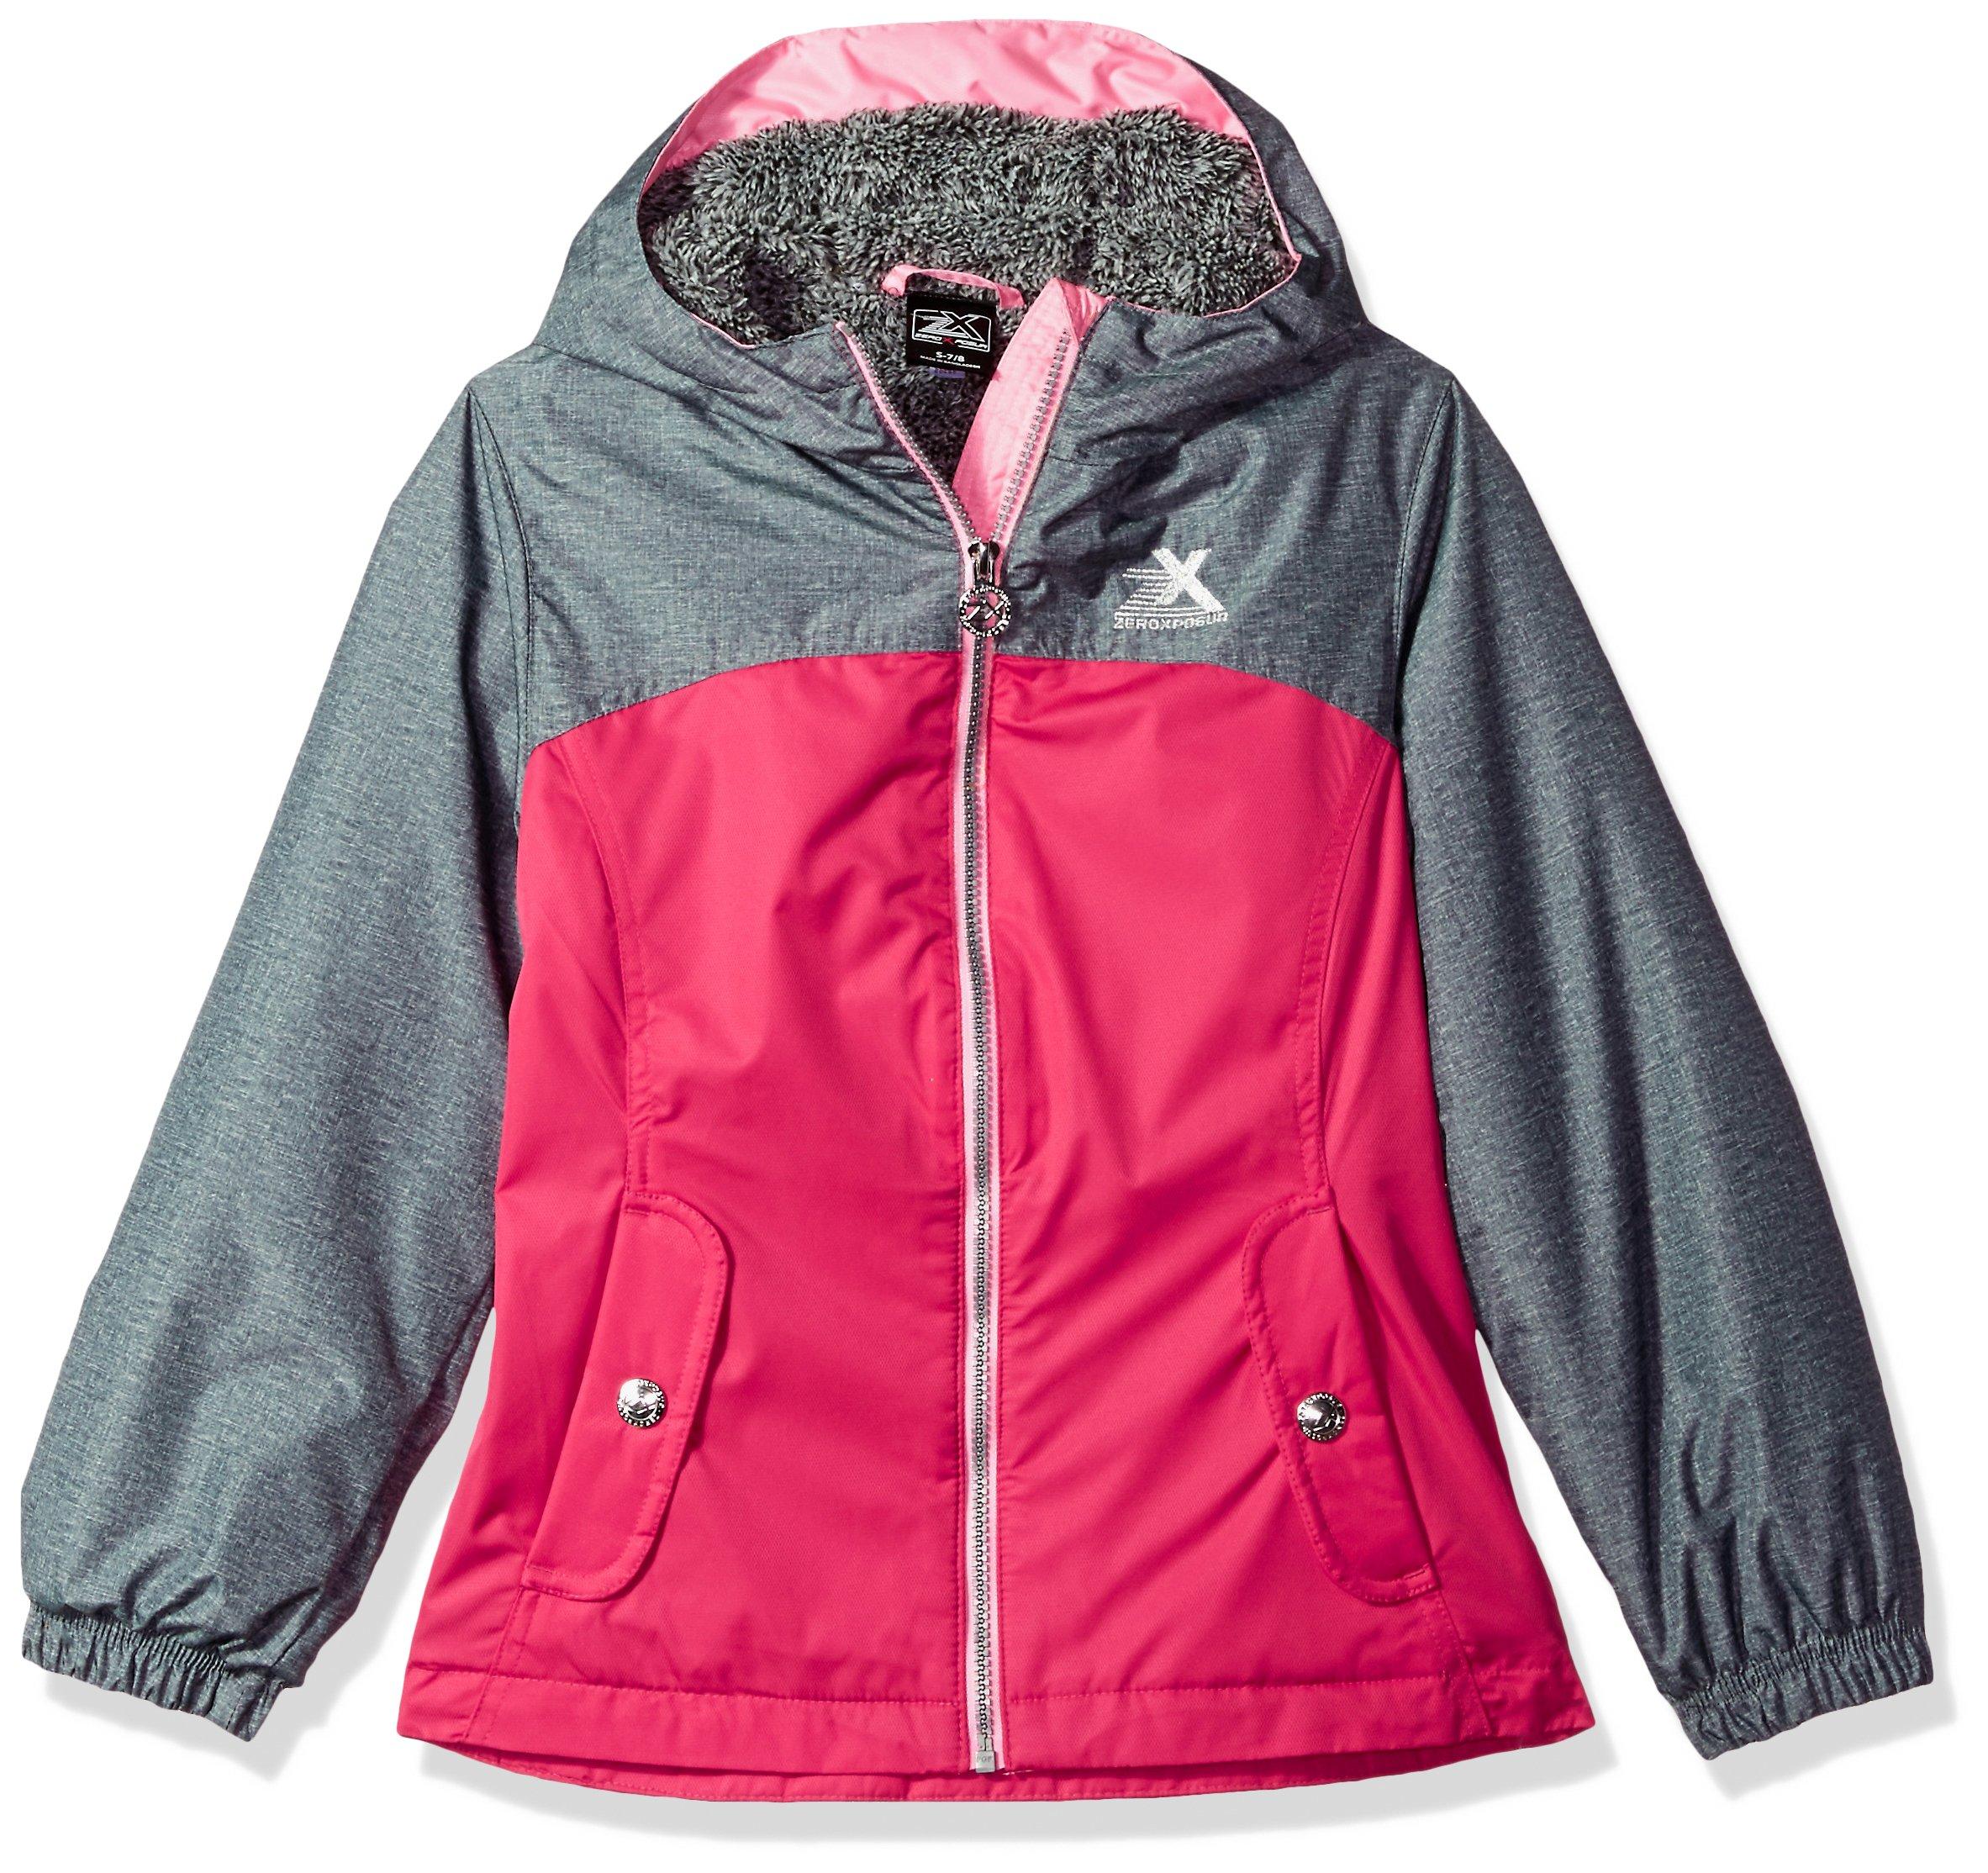 ZeroXposur Big Girls' Elissa Transitional Jacket, Cerise, X Large by ZeroXposur